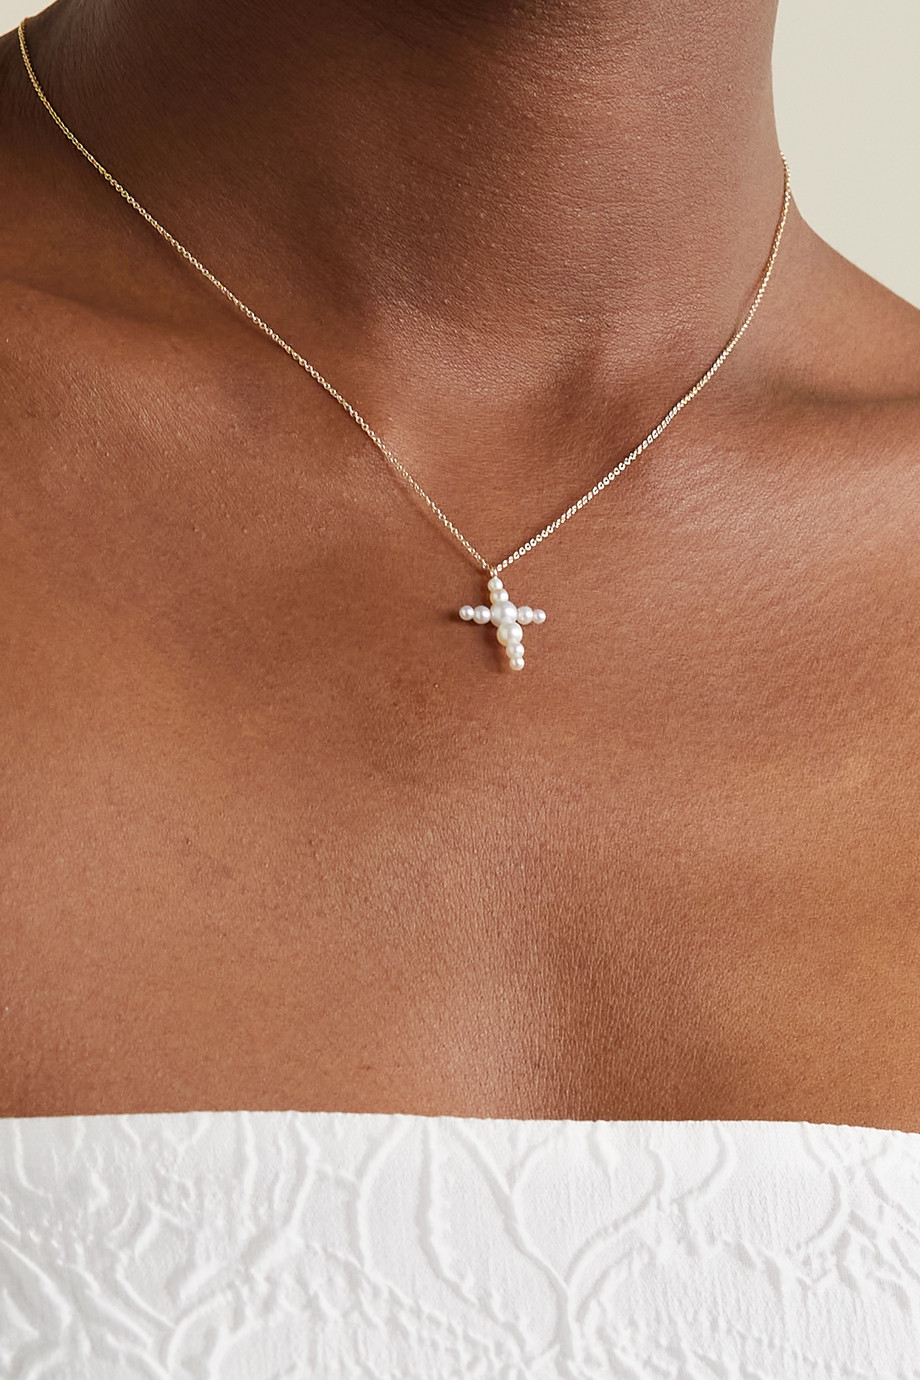 Sophie Bille Brahe Petite Fellini 14-karat gold pearl necklace